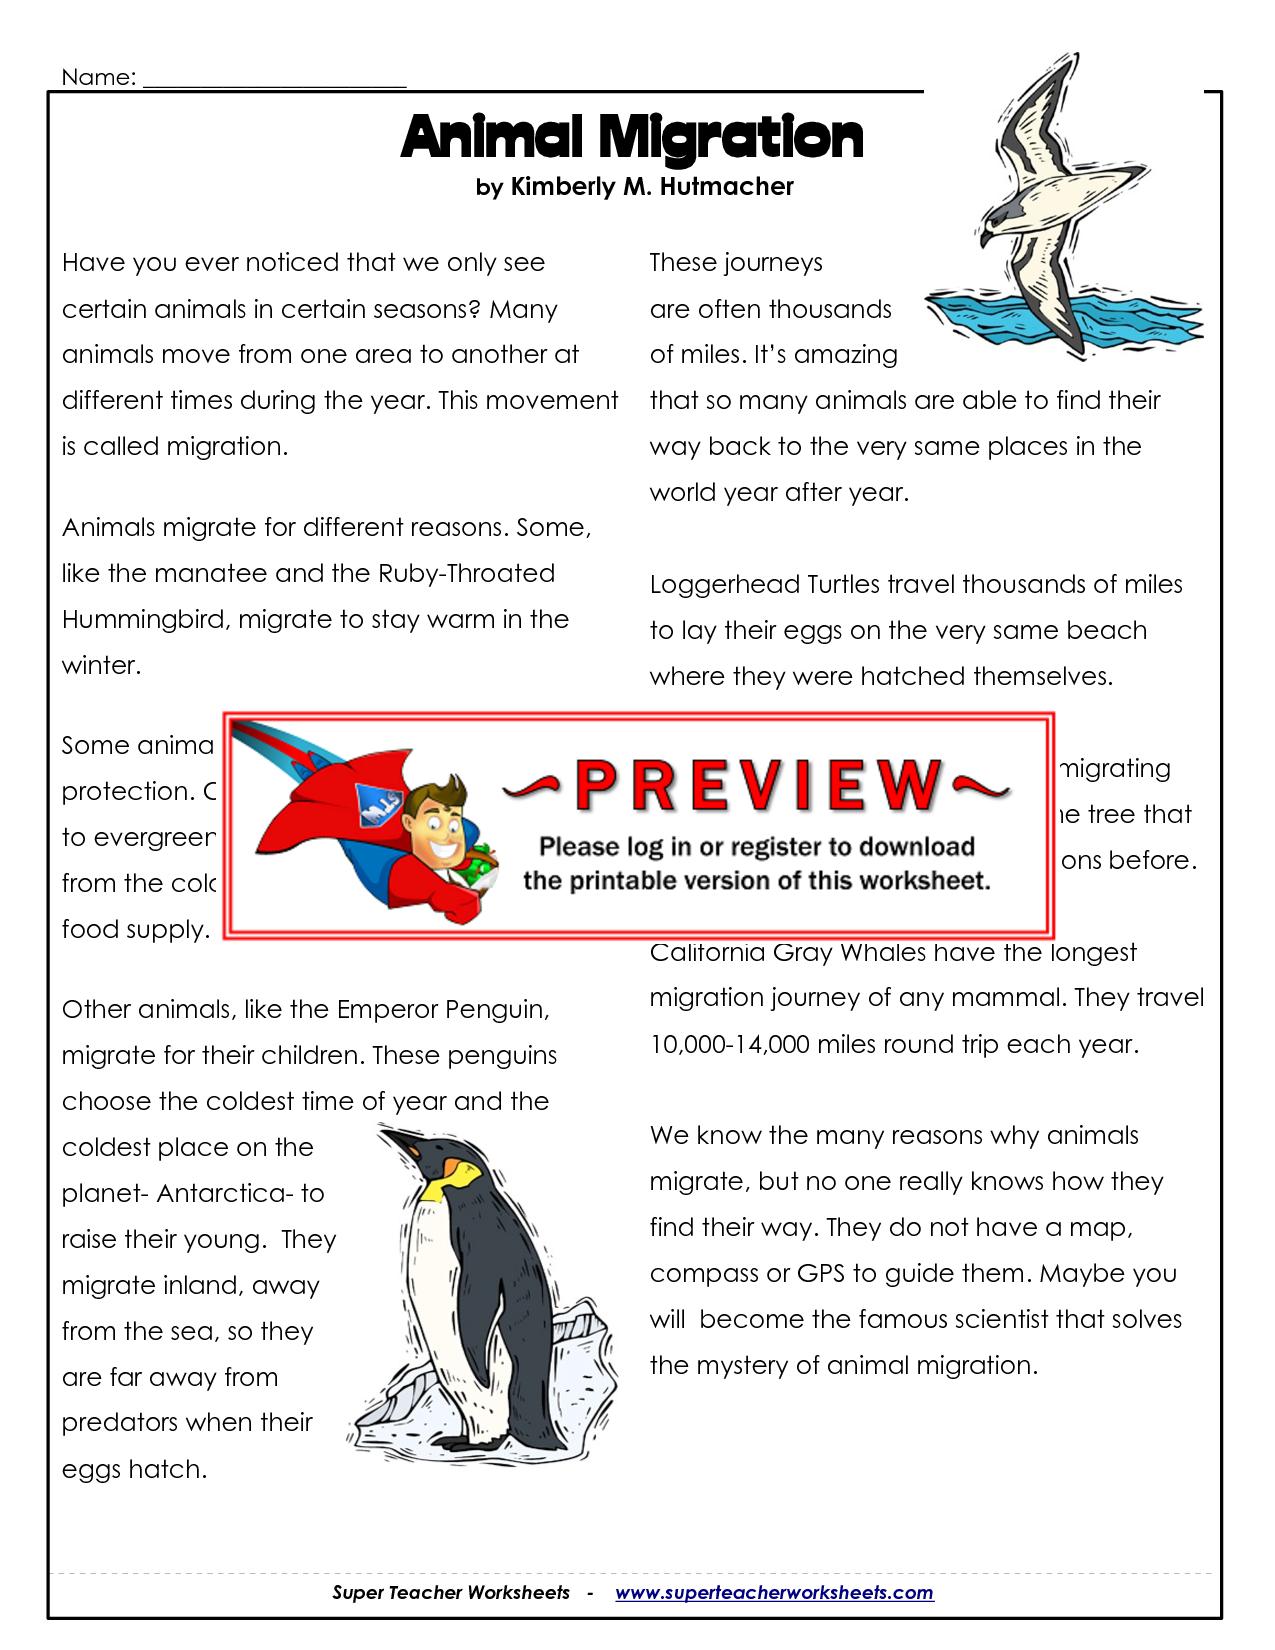 bird migration worksheets google search education science pinterest bird migration and. Black Bedroom Furniture Sets. Home Design Ideas